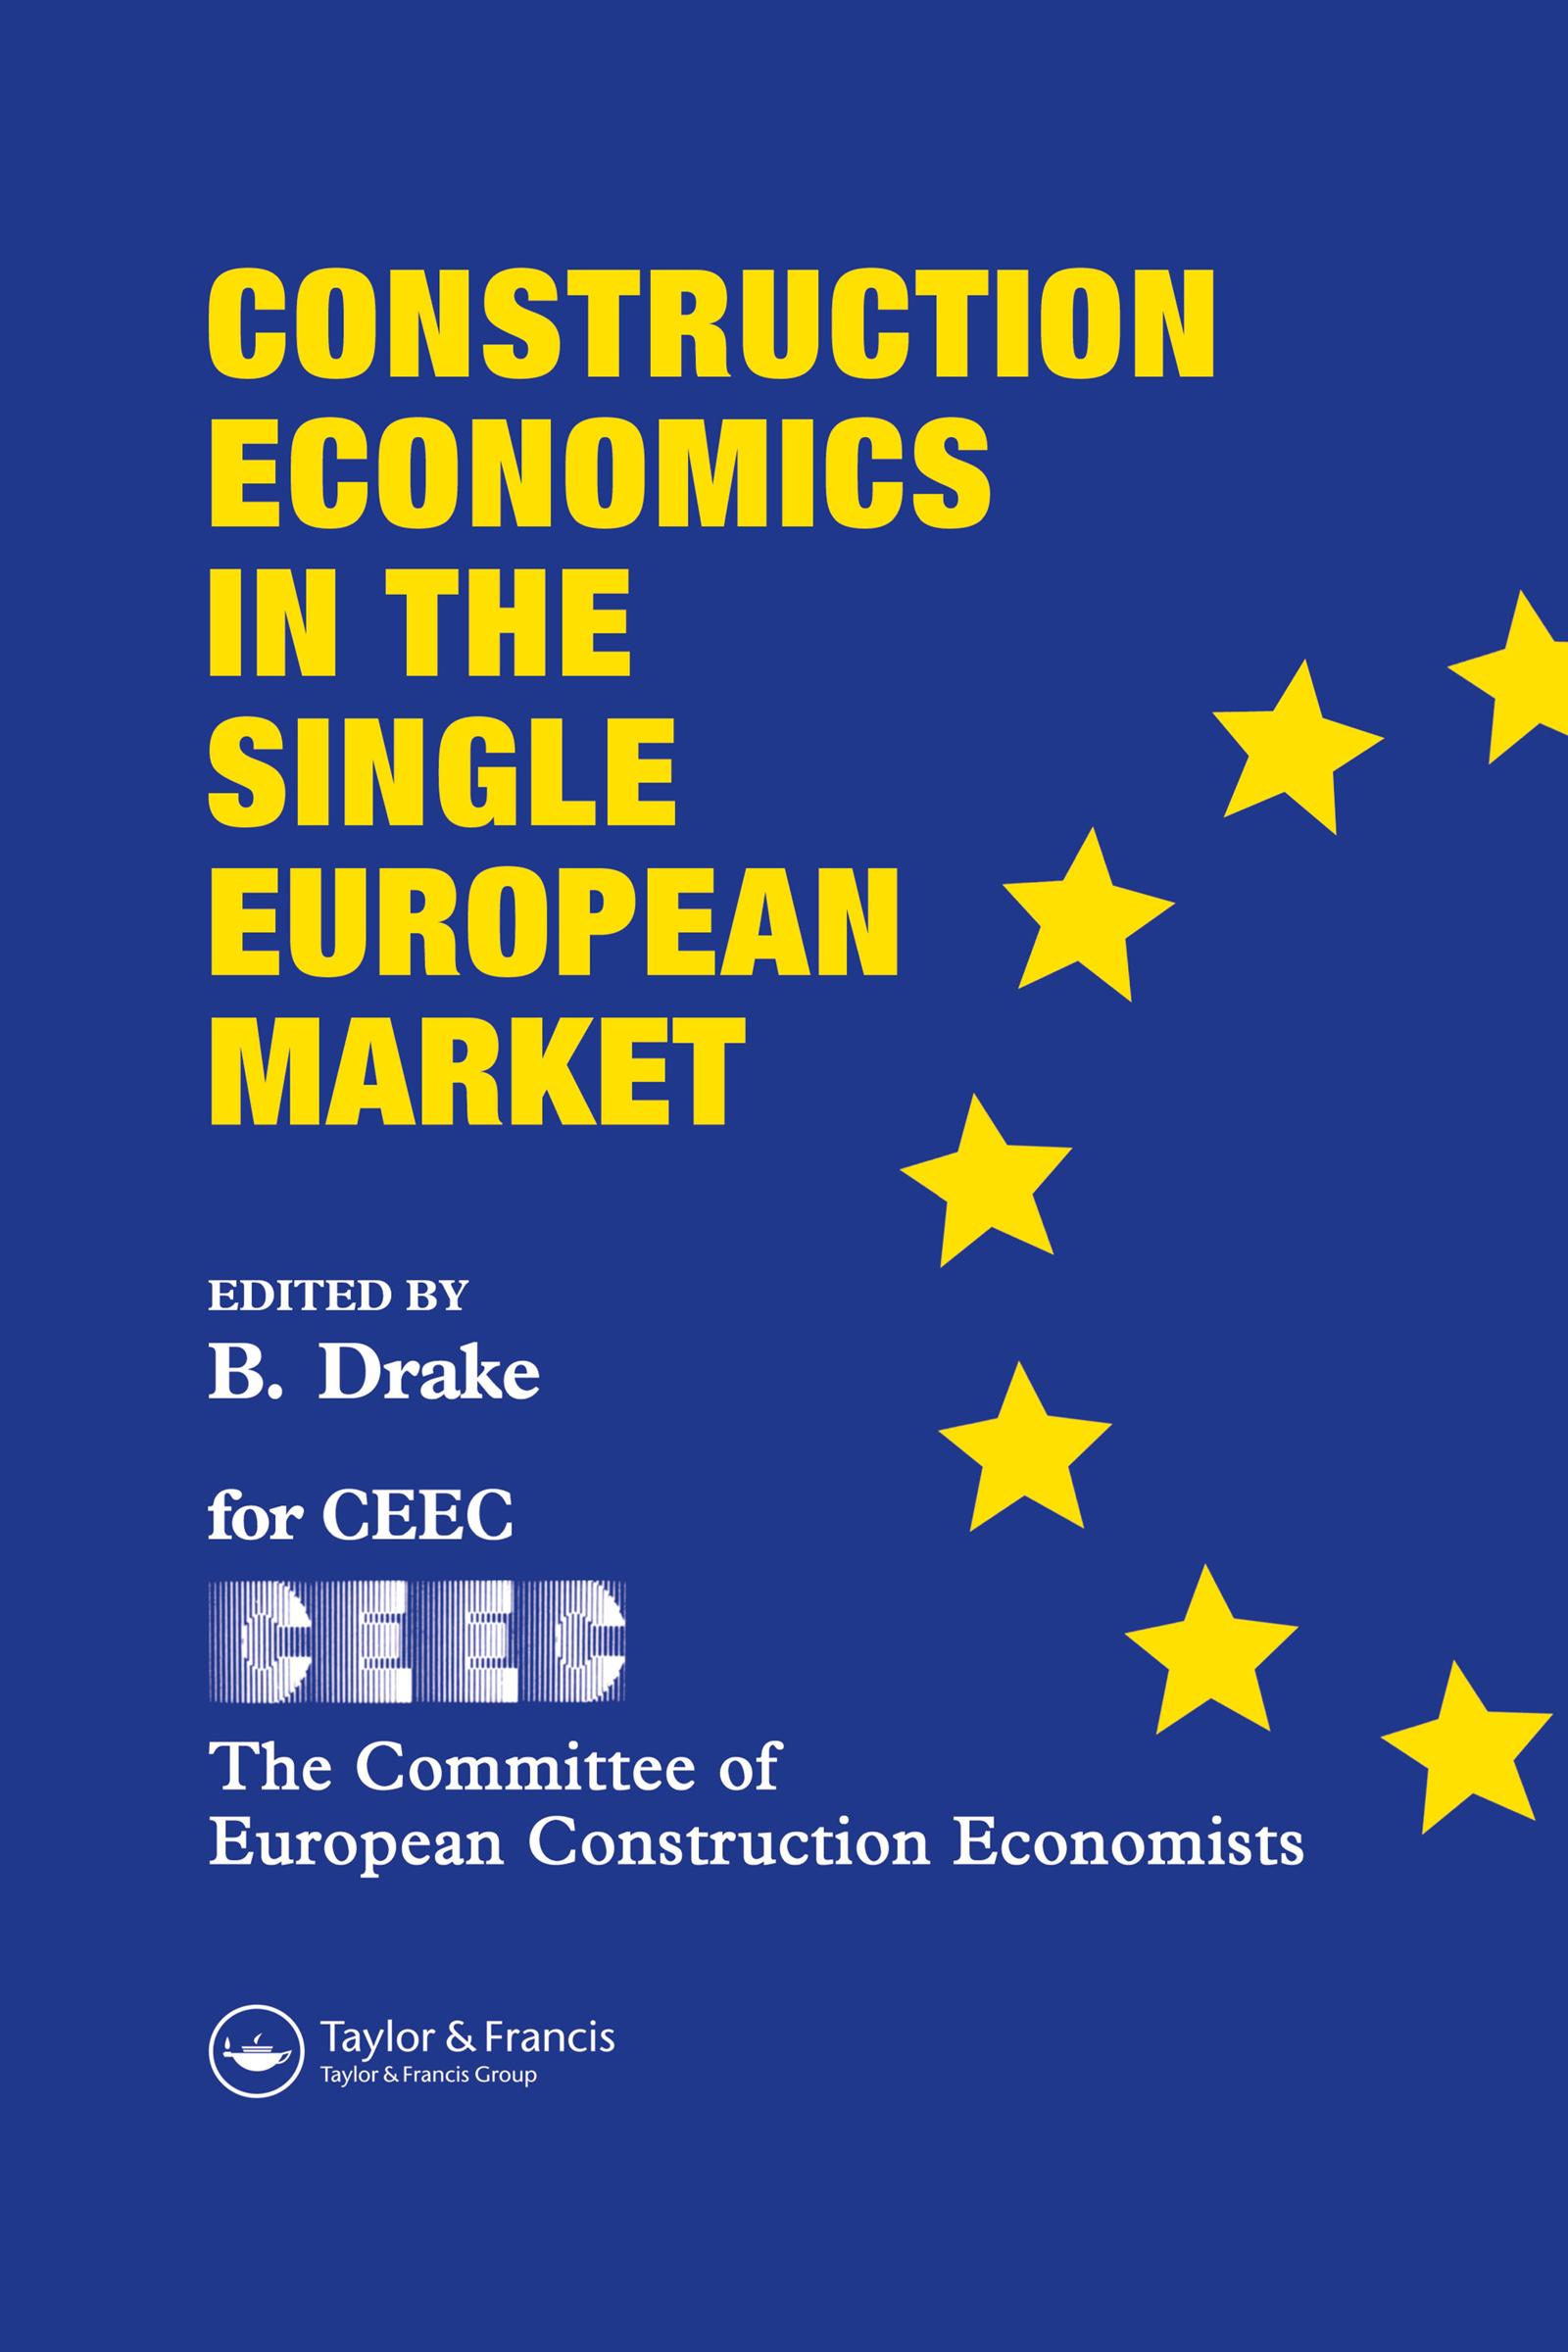 Construction Economics in the Single European Market